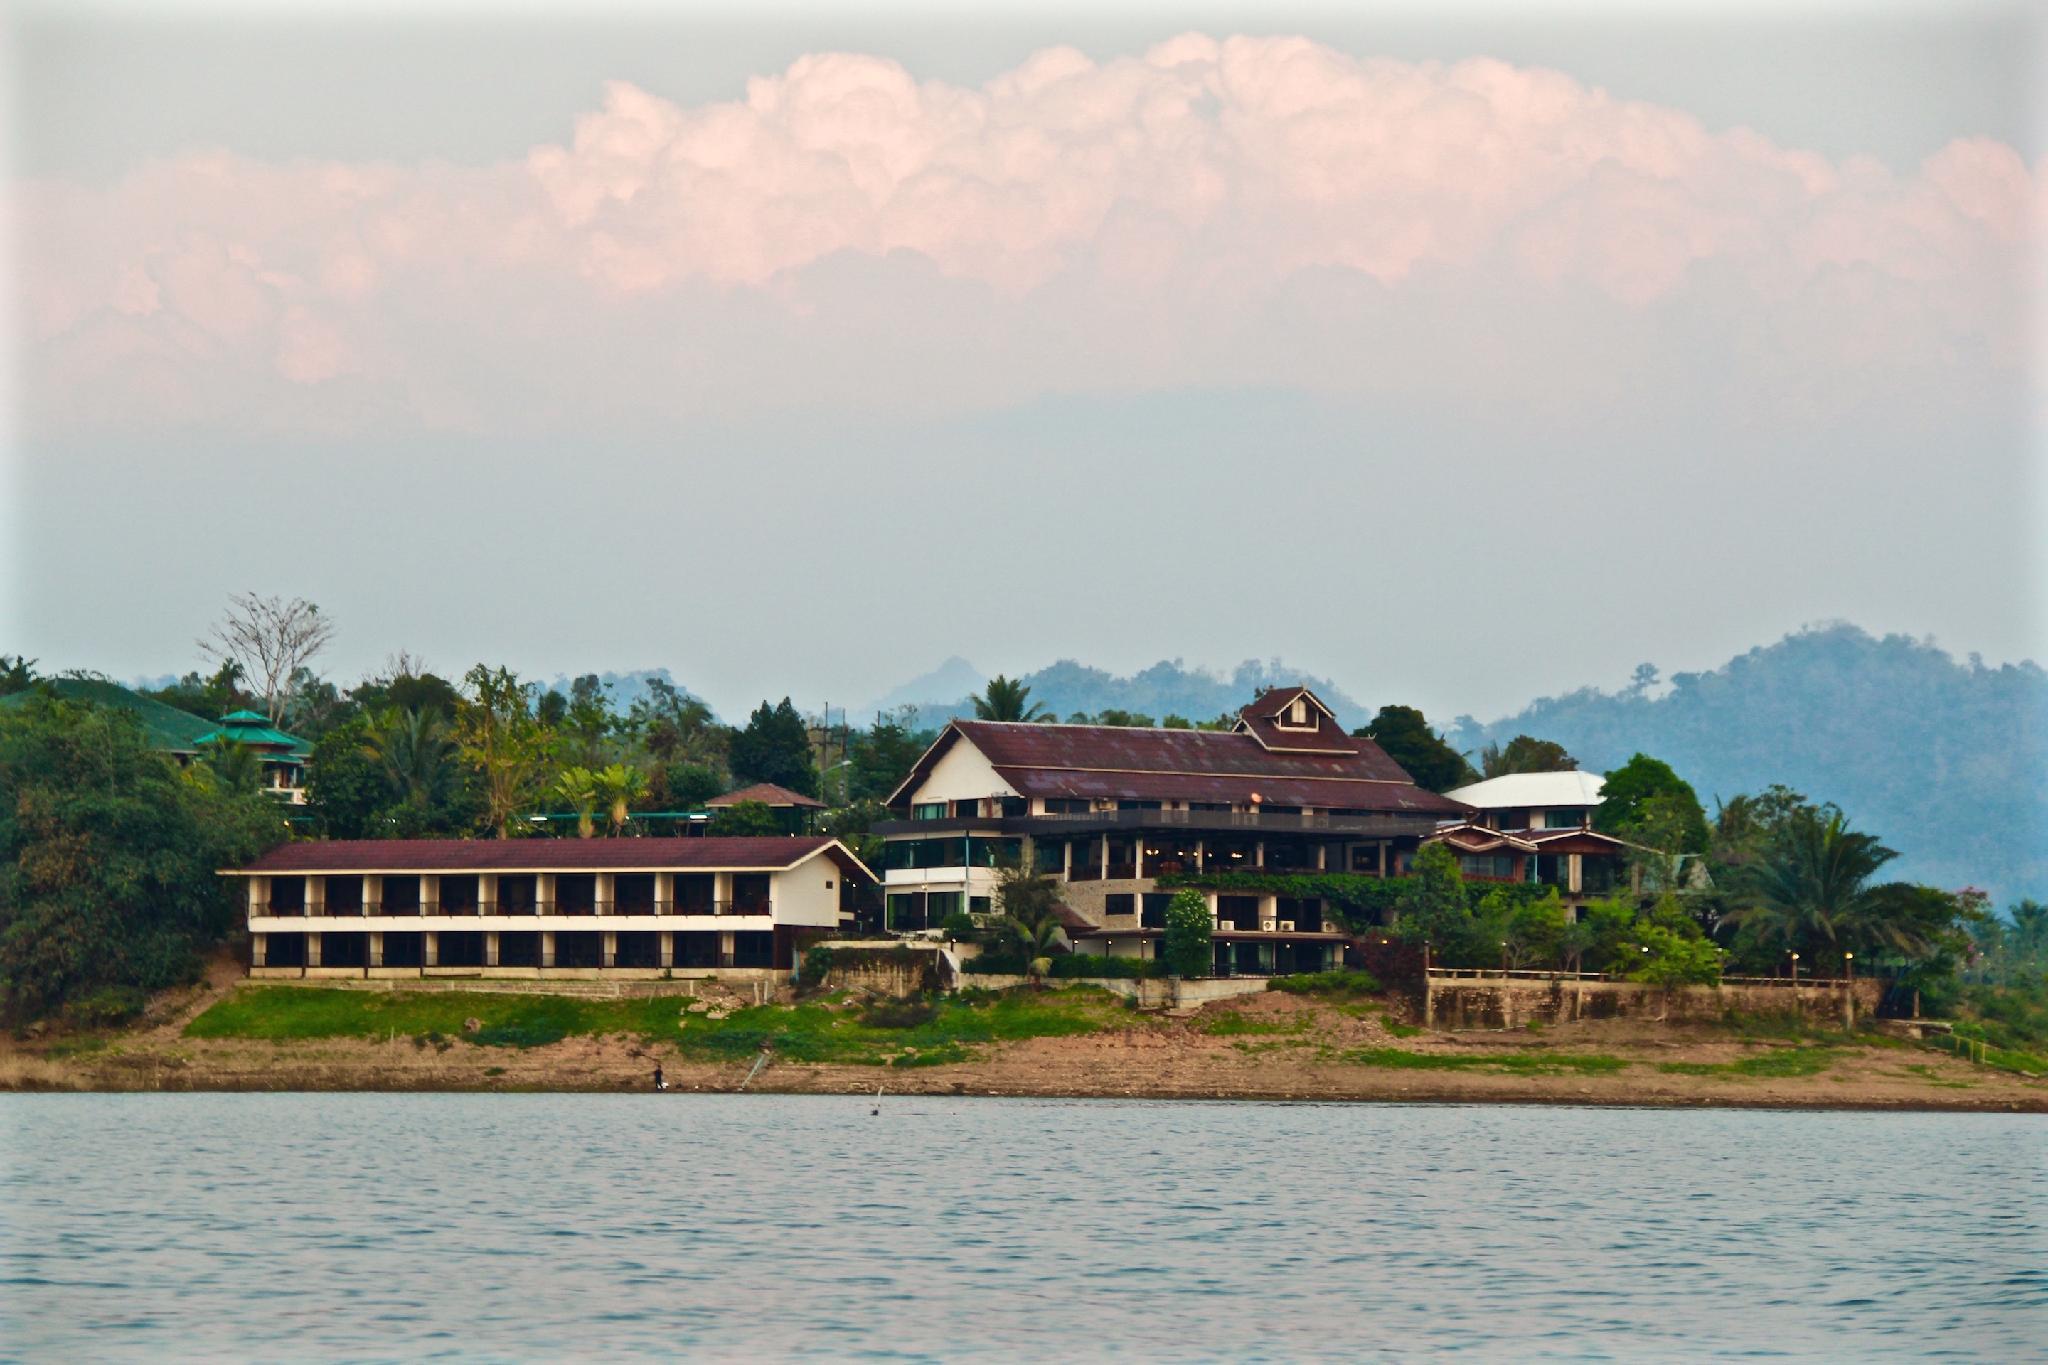 Pornpailin Riverside Resort พรไพลิน ริเวอร์ไซด์ รีสอร์ท